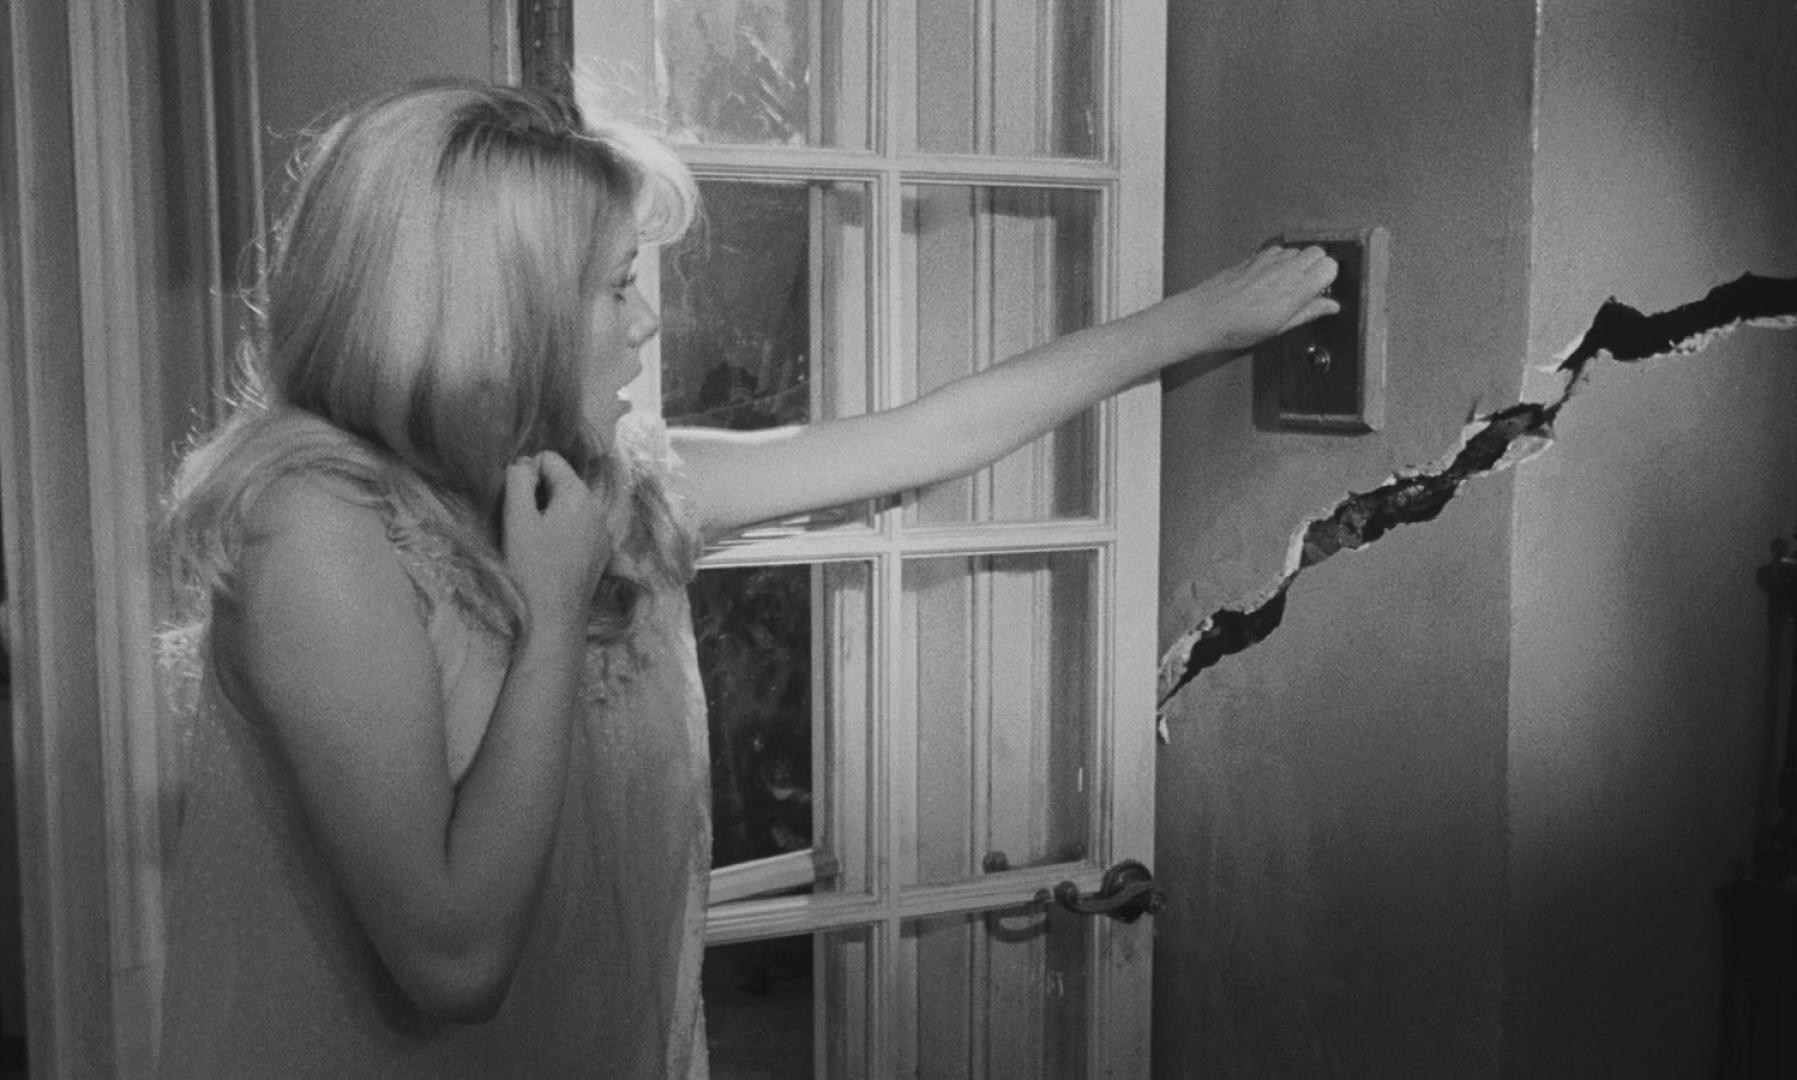 Repulsion - Iszonyat (1965) 1. kép